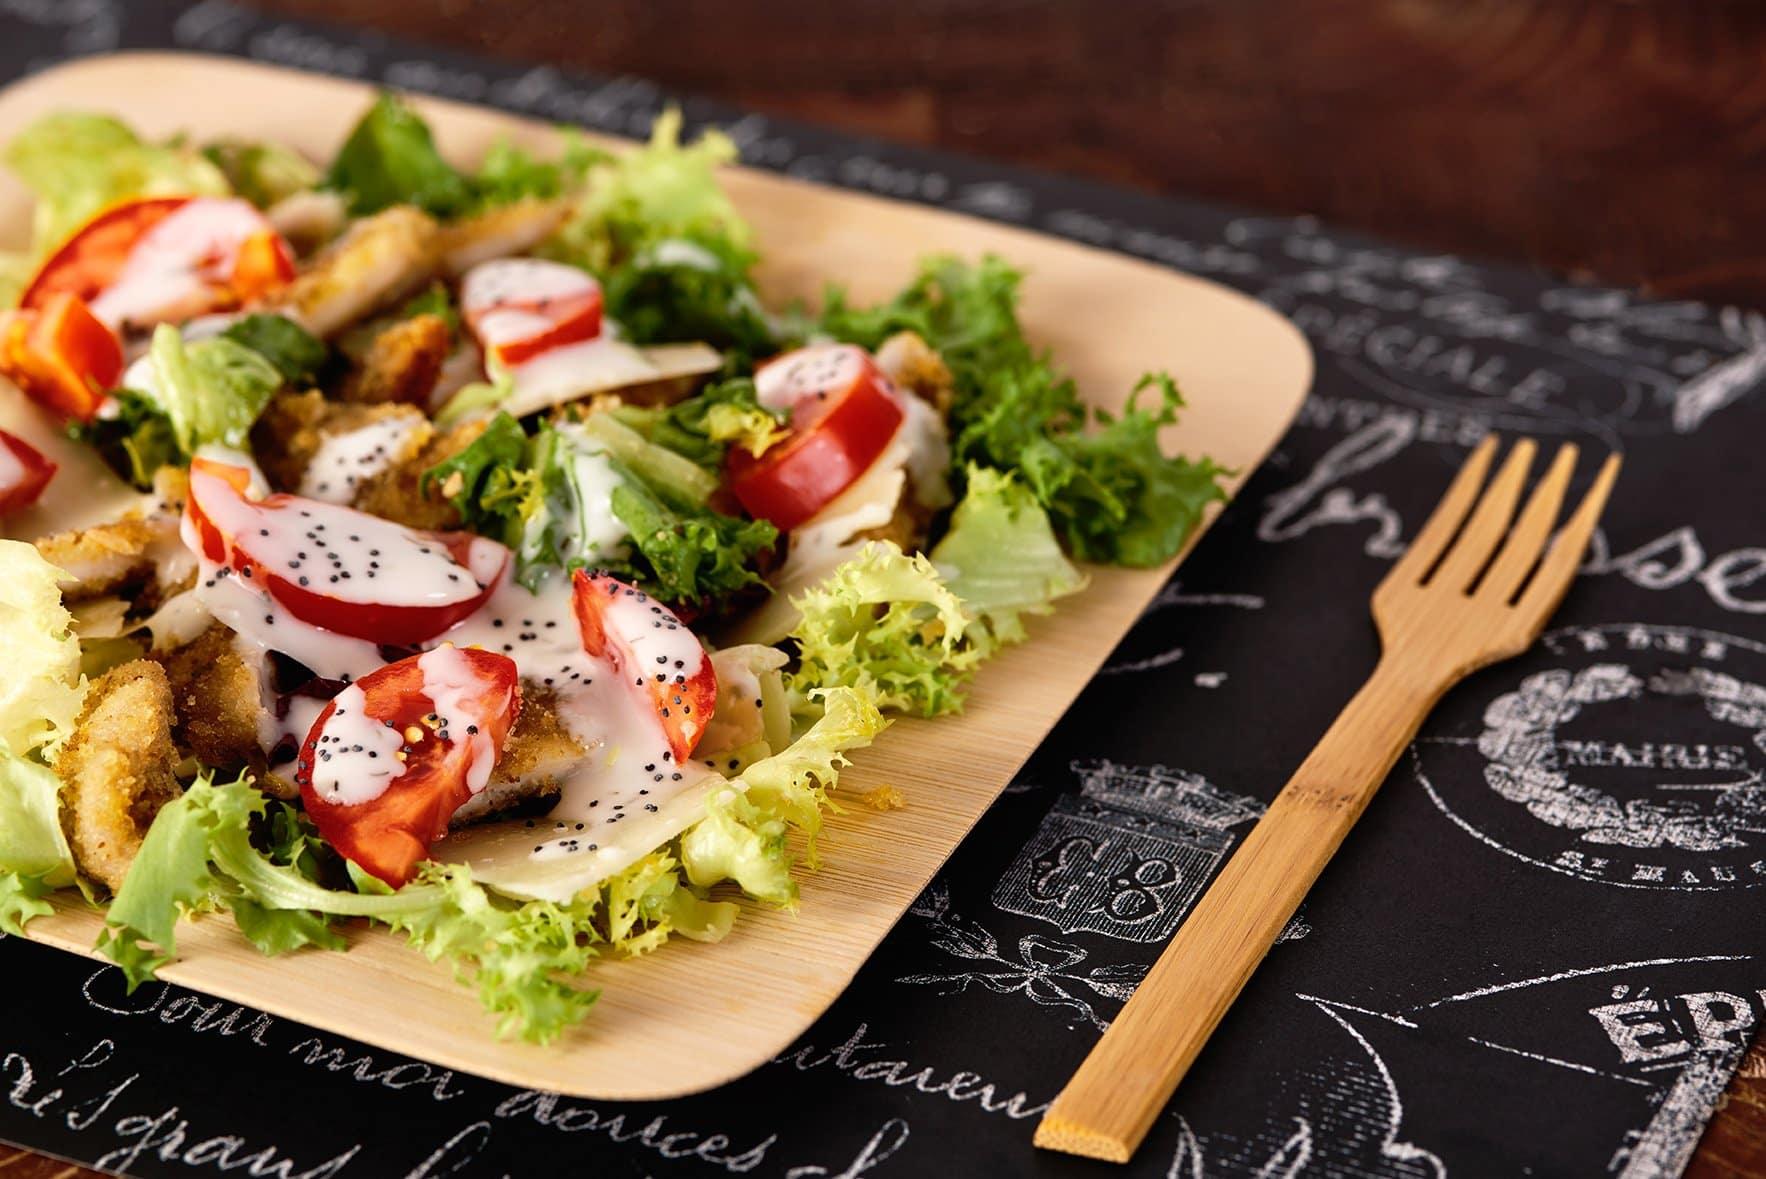 bbadv-shooting-bricco-e-bacco-centro-carne-insalata-pollo